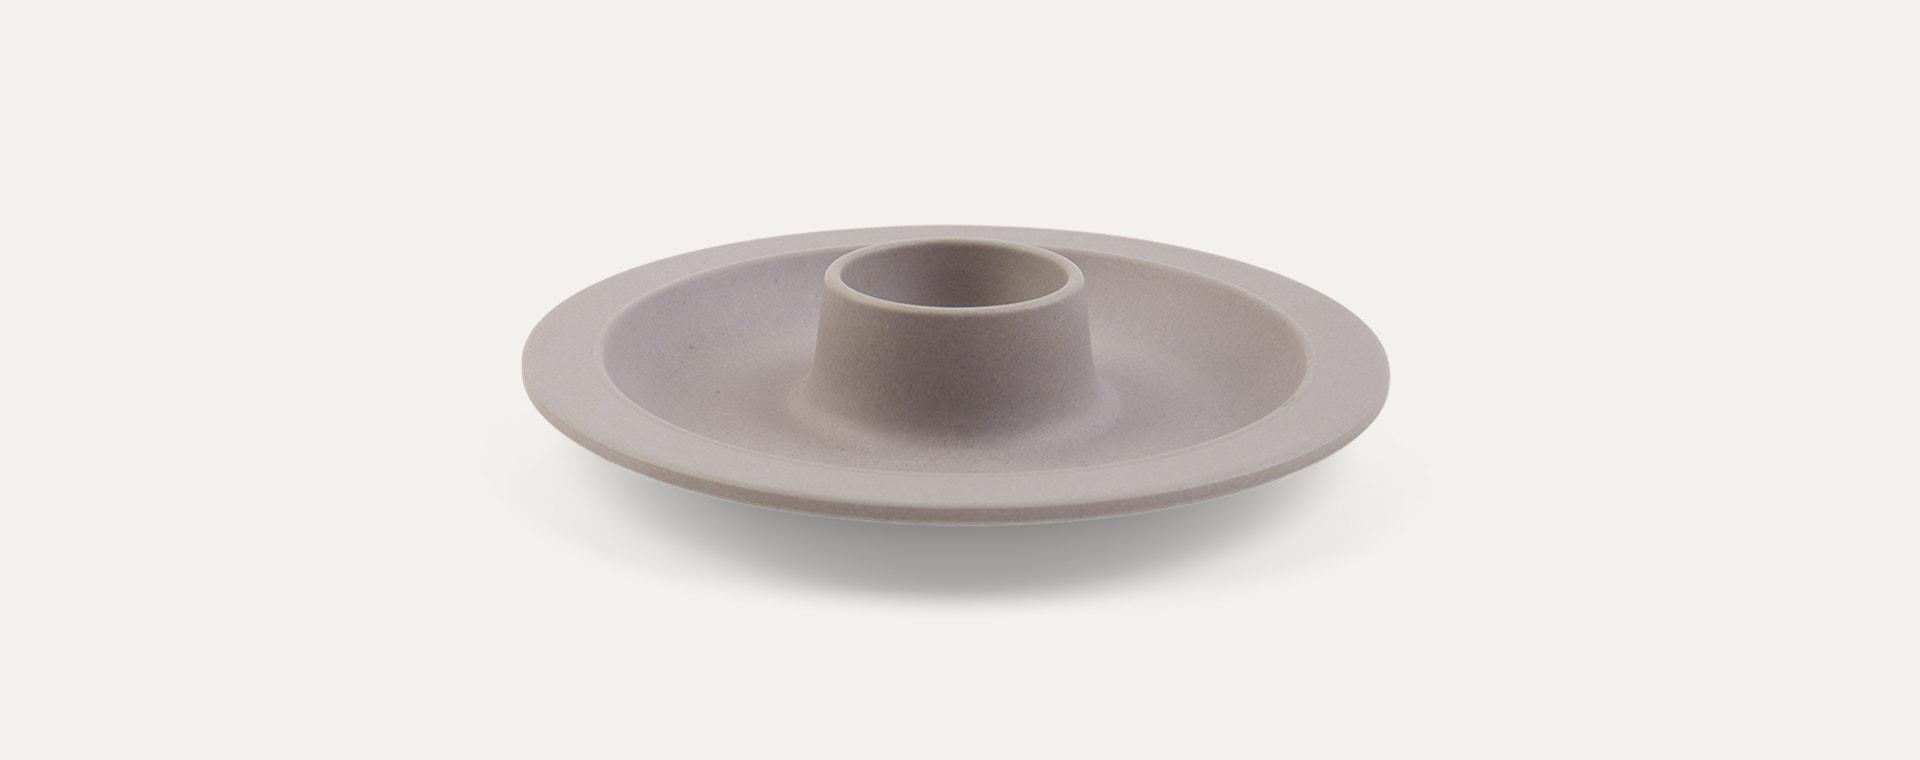 Grey Zuperzozial Dippy Egg Plate